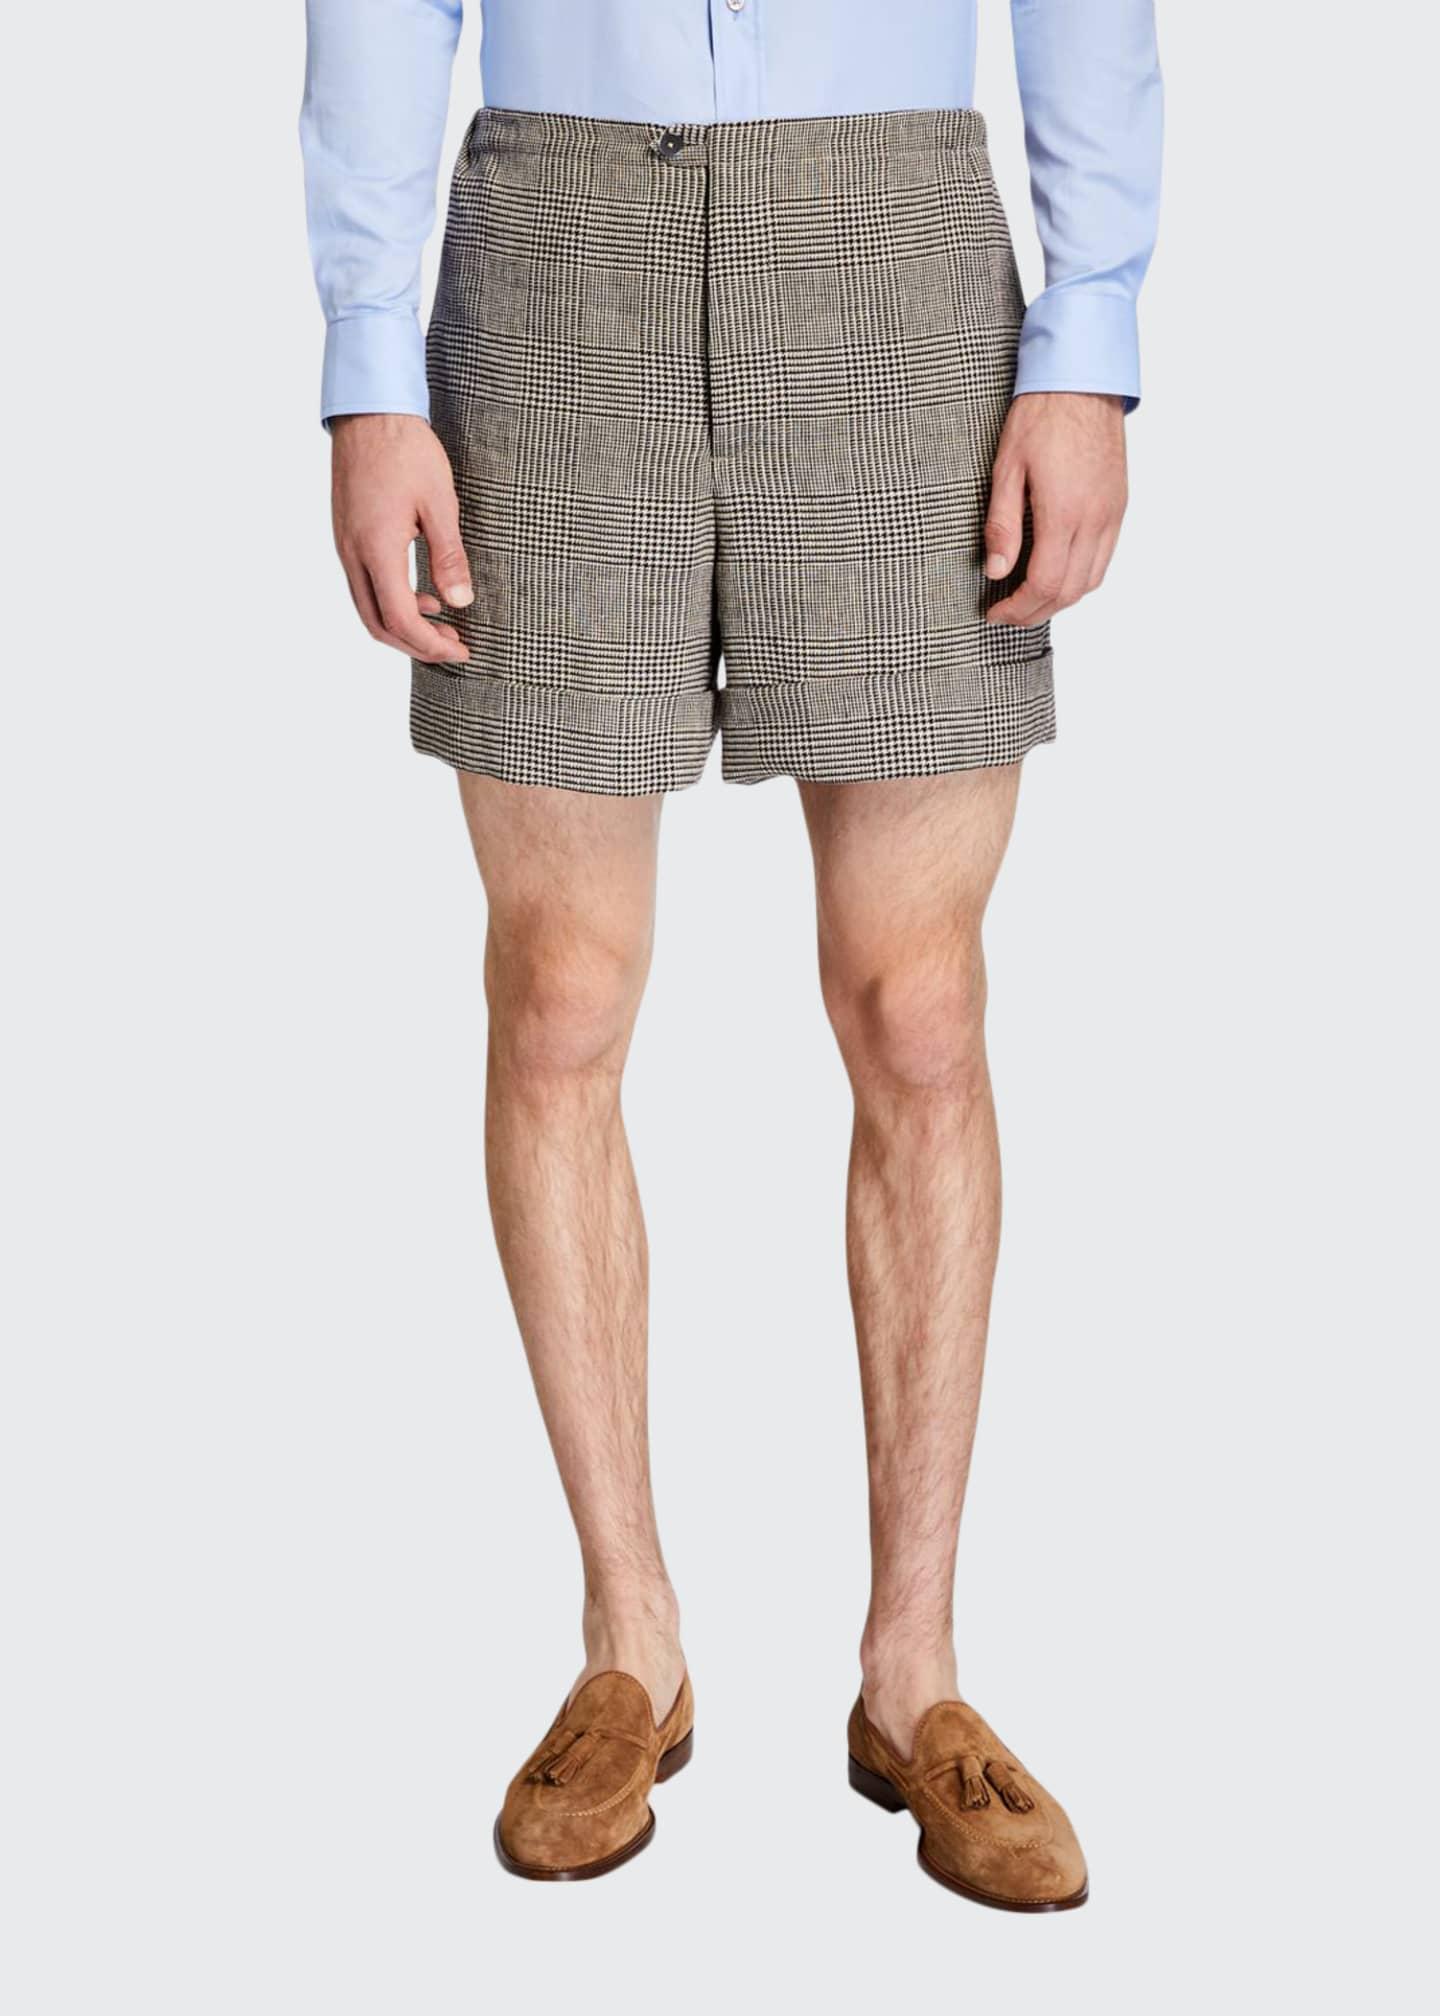 Gucci Men's Glen Plaid Linen Shorts